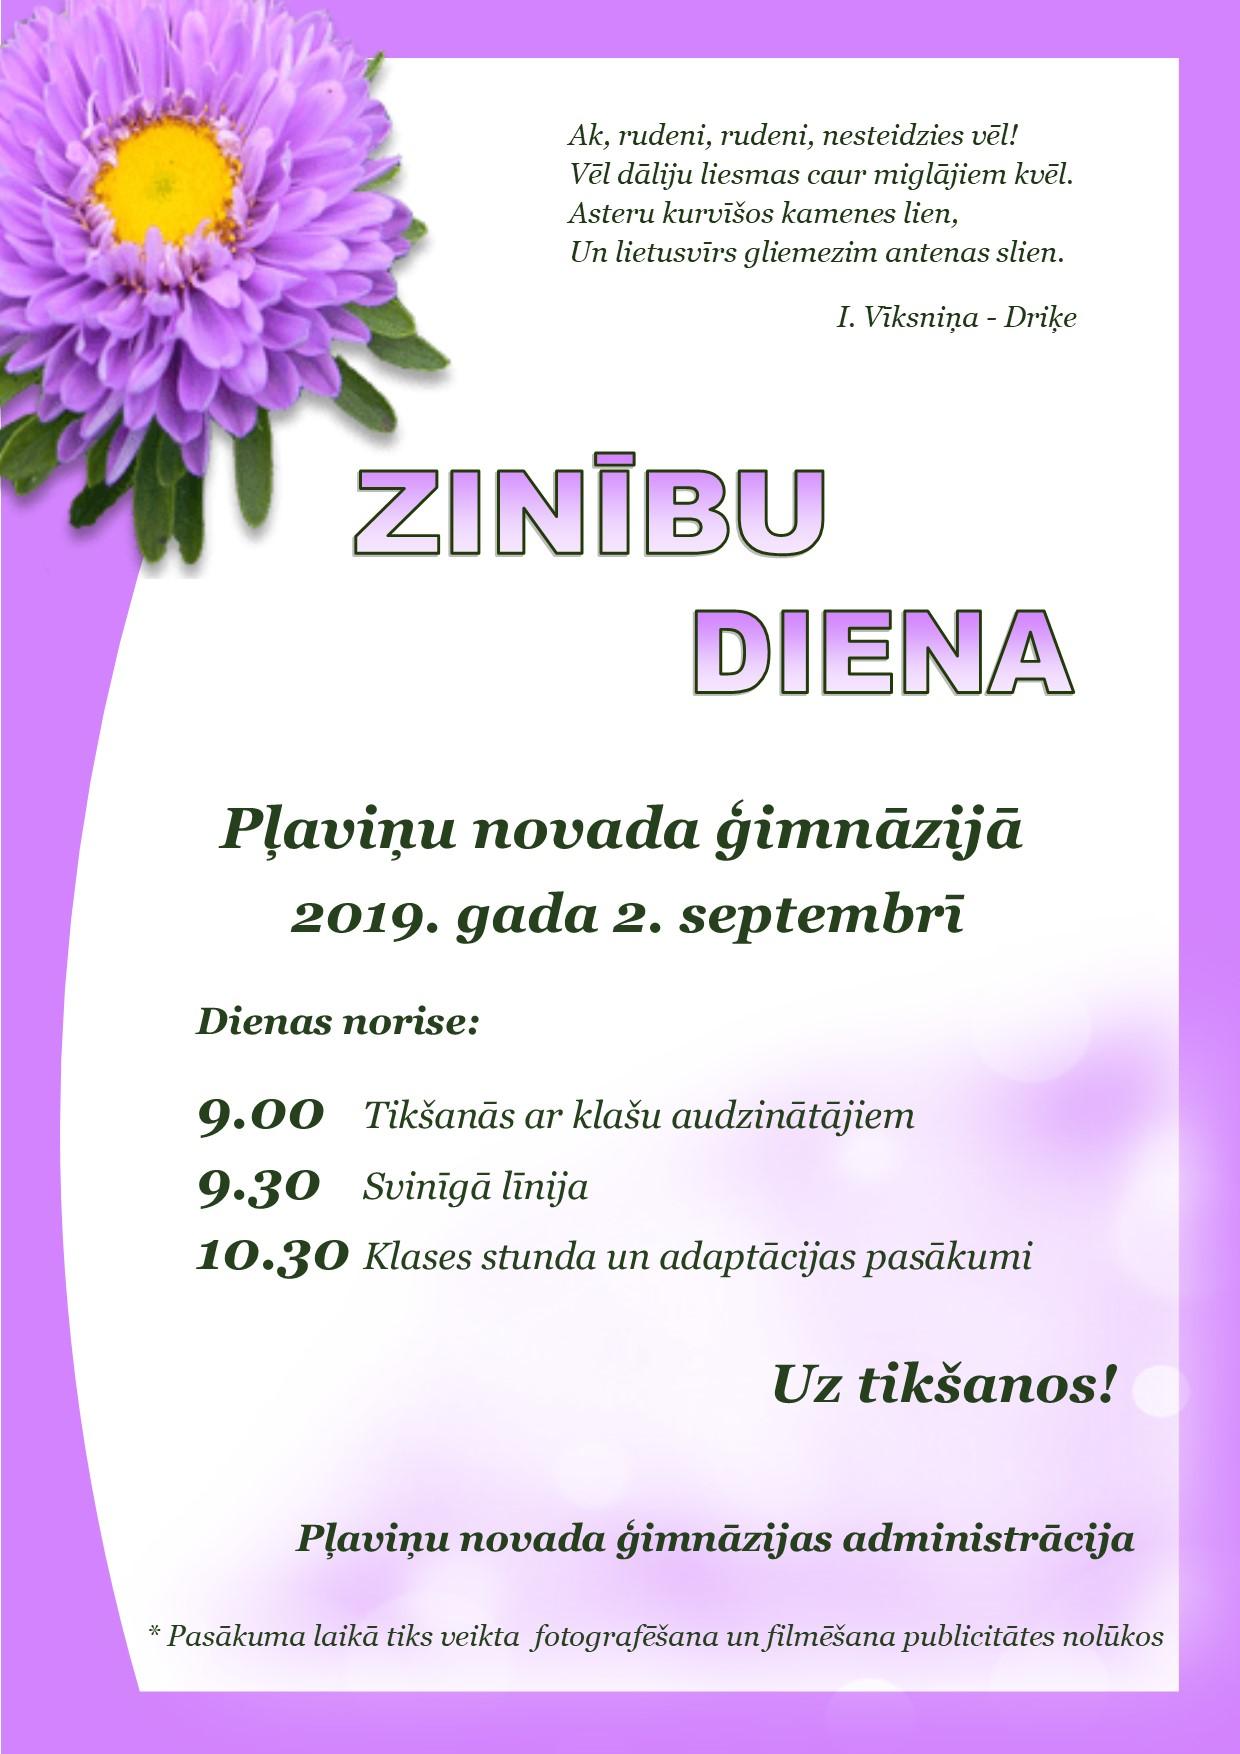 afisa_zinibu_diena_2019